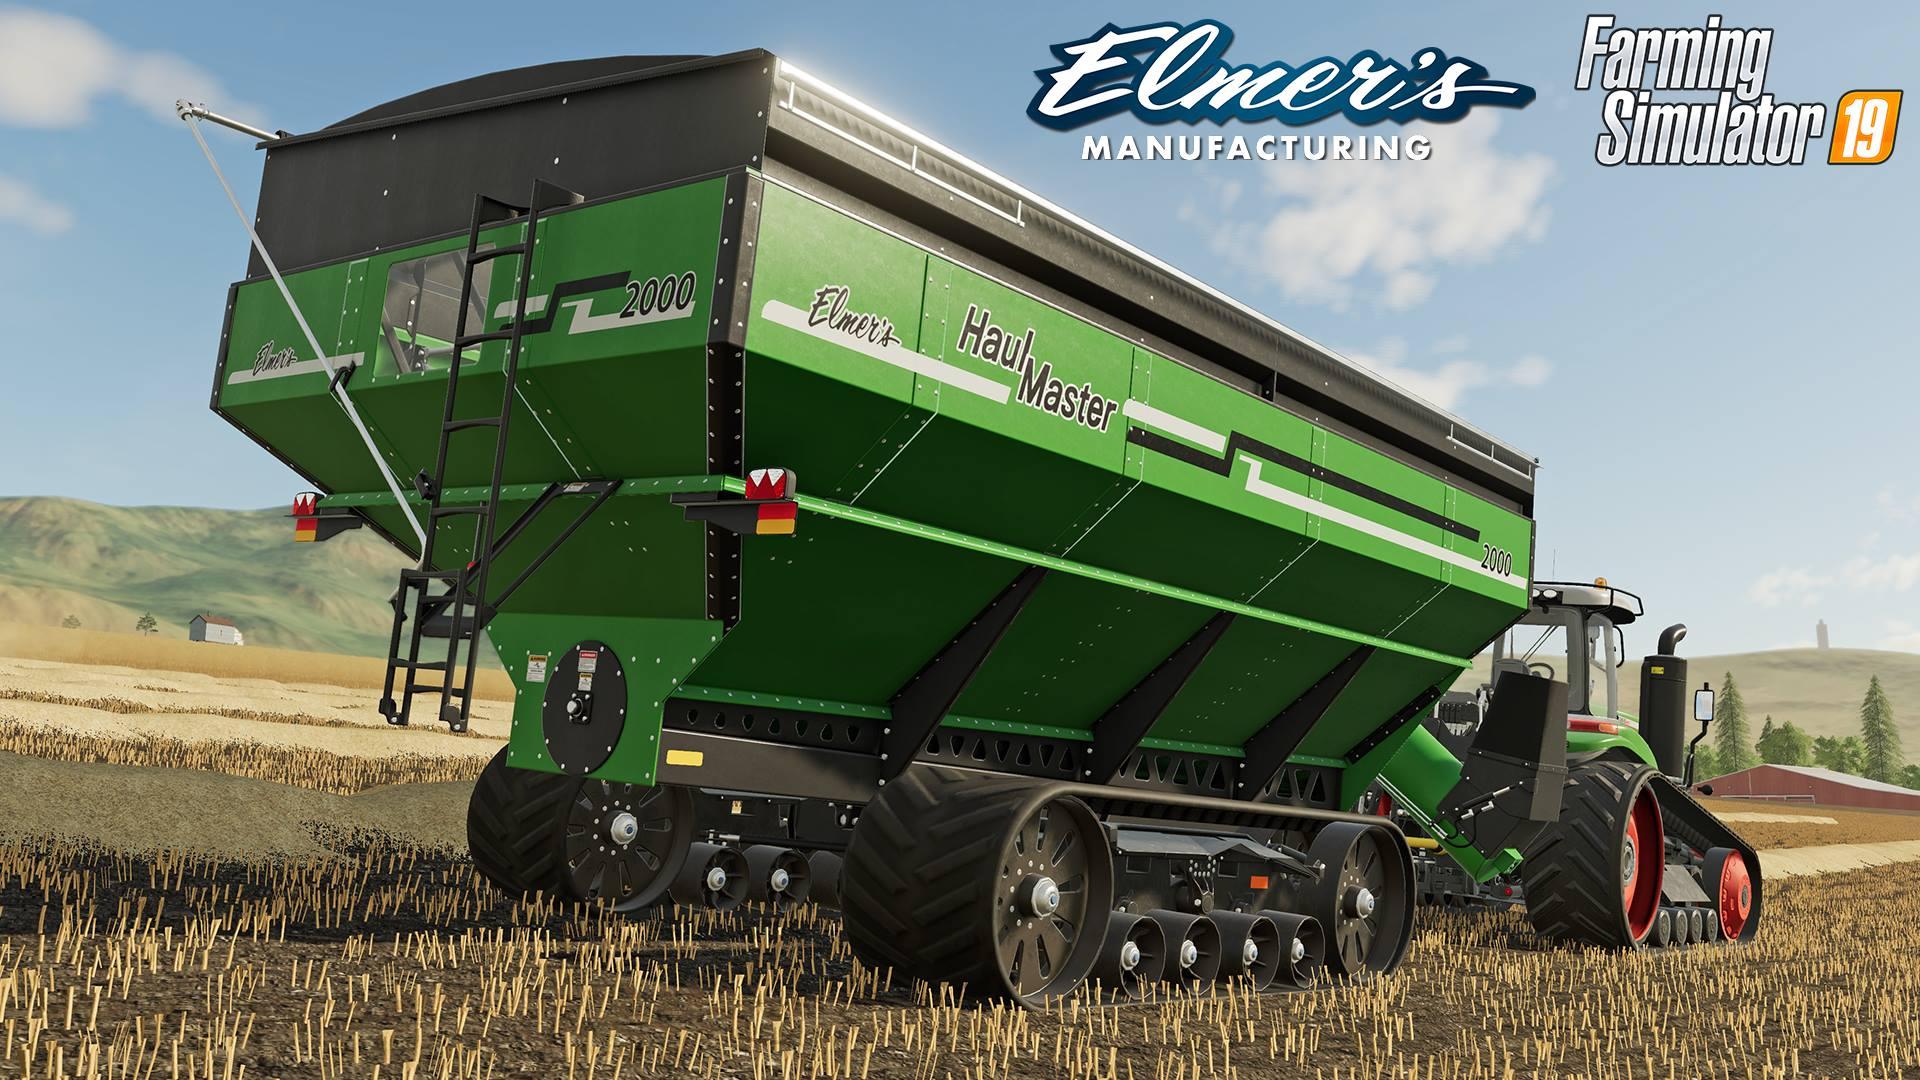 Farming Simulator 19 XTRACTOR | FS19 mods, Farming simulator